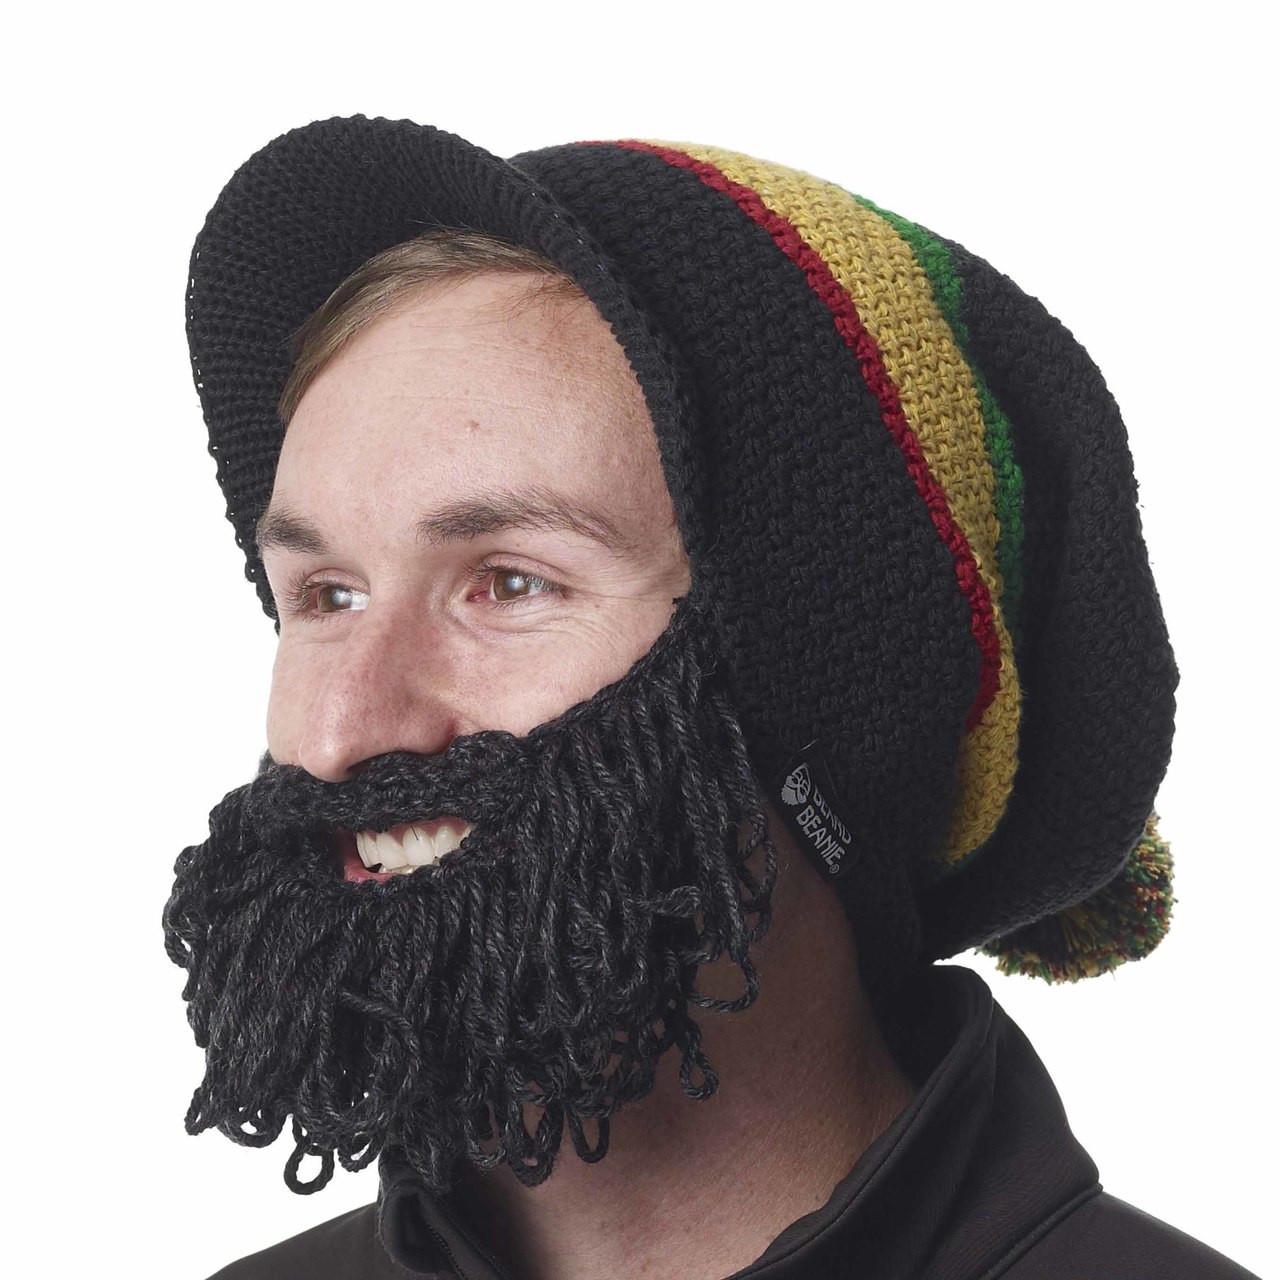 4601d9f33b5 The Original Beard Beanie Rasta Style